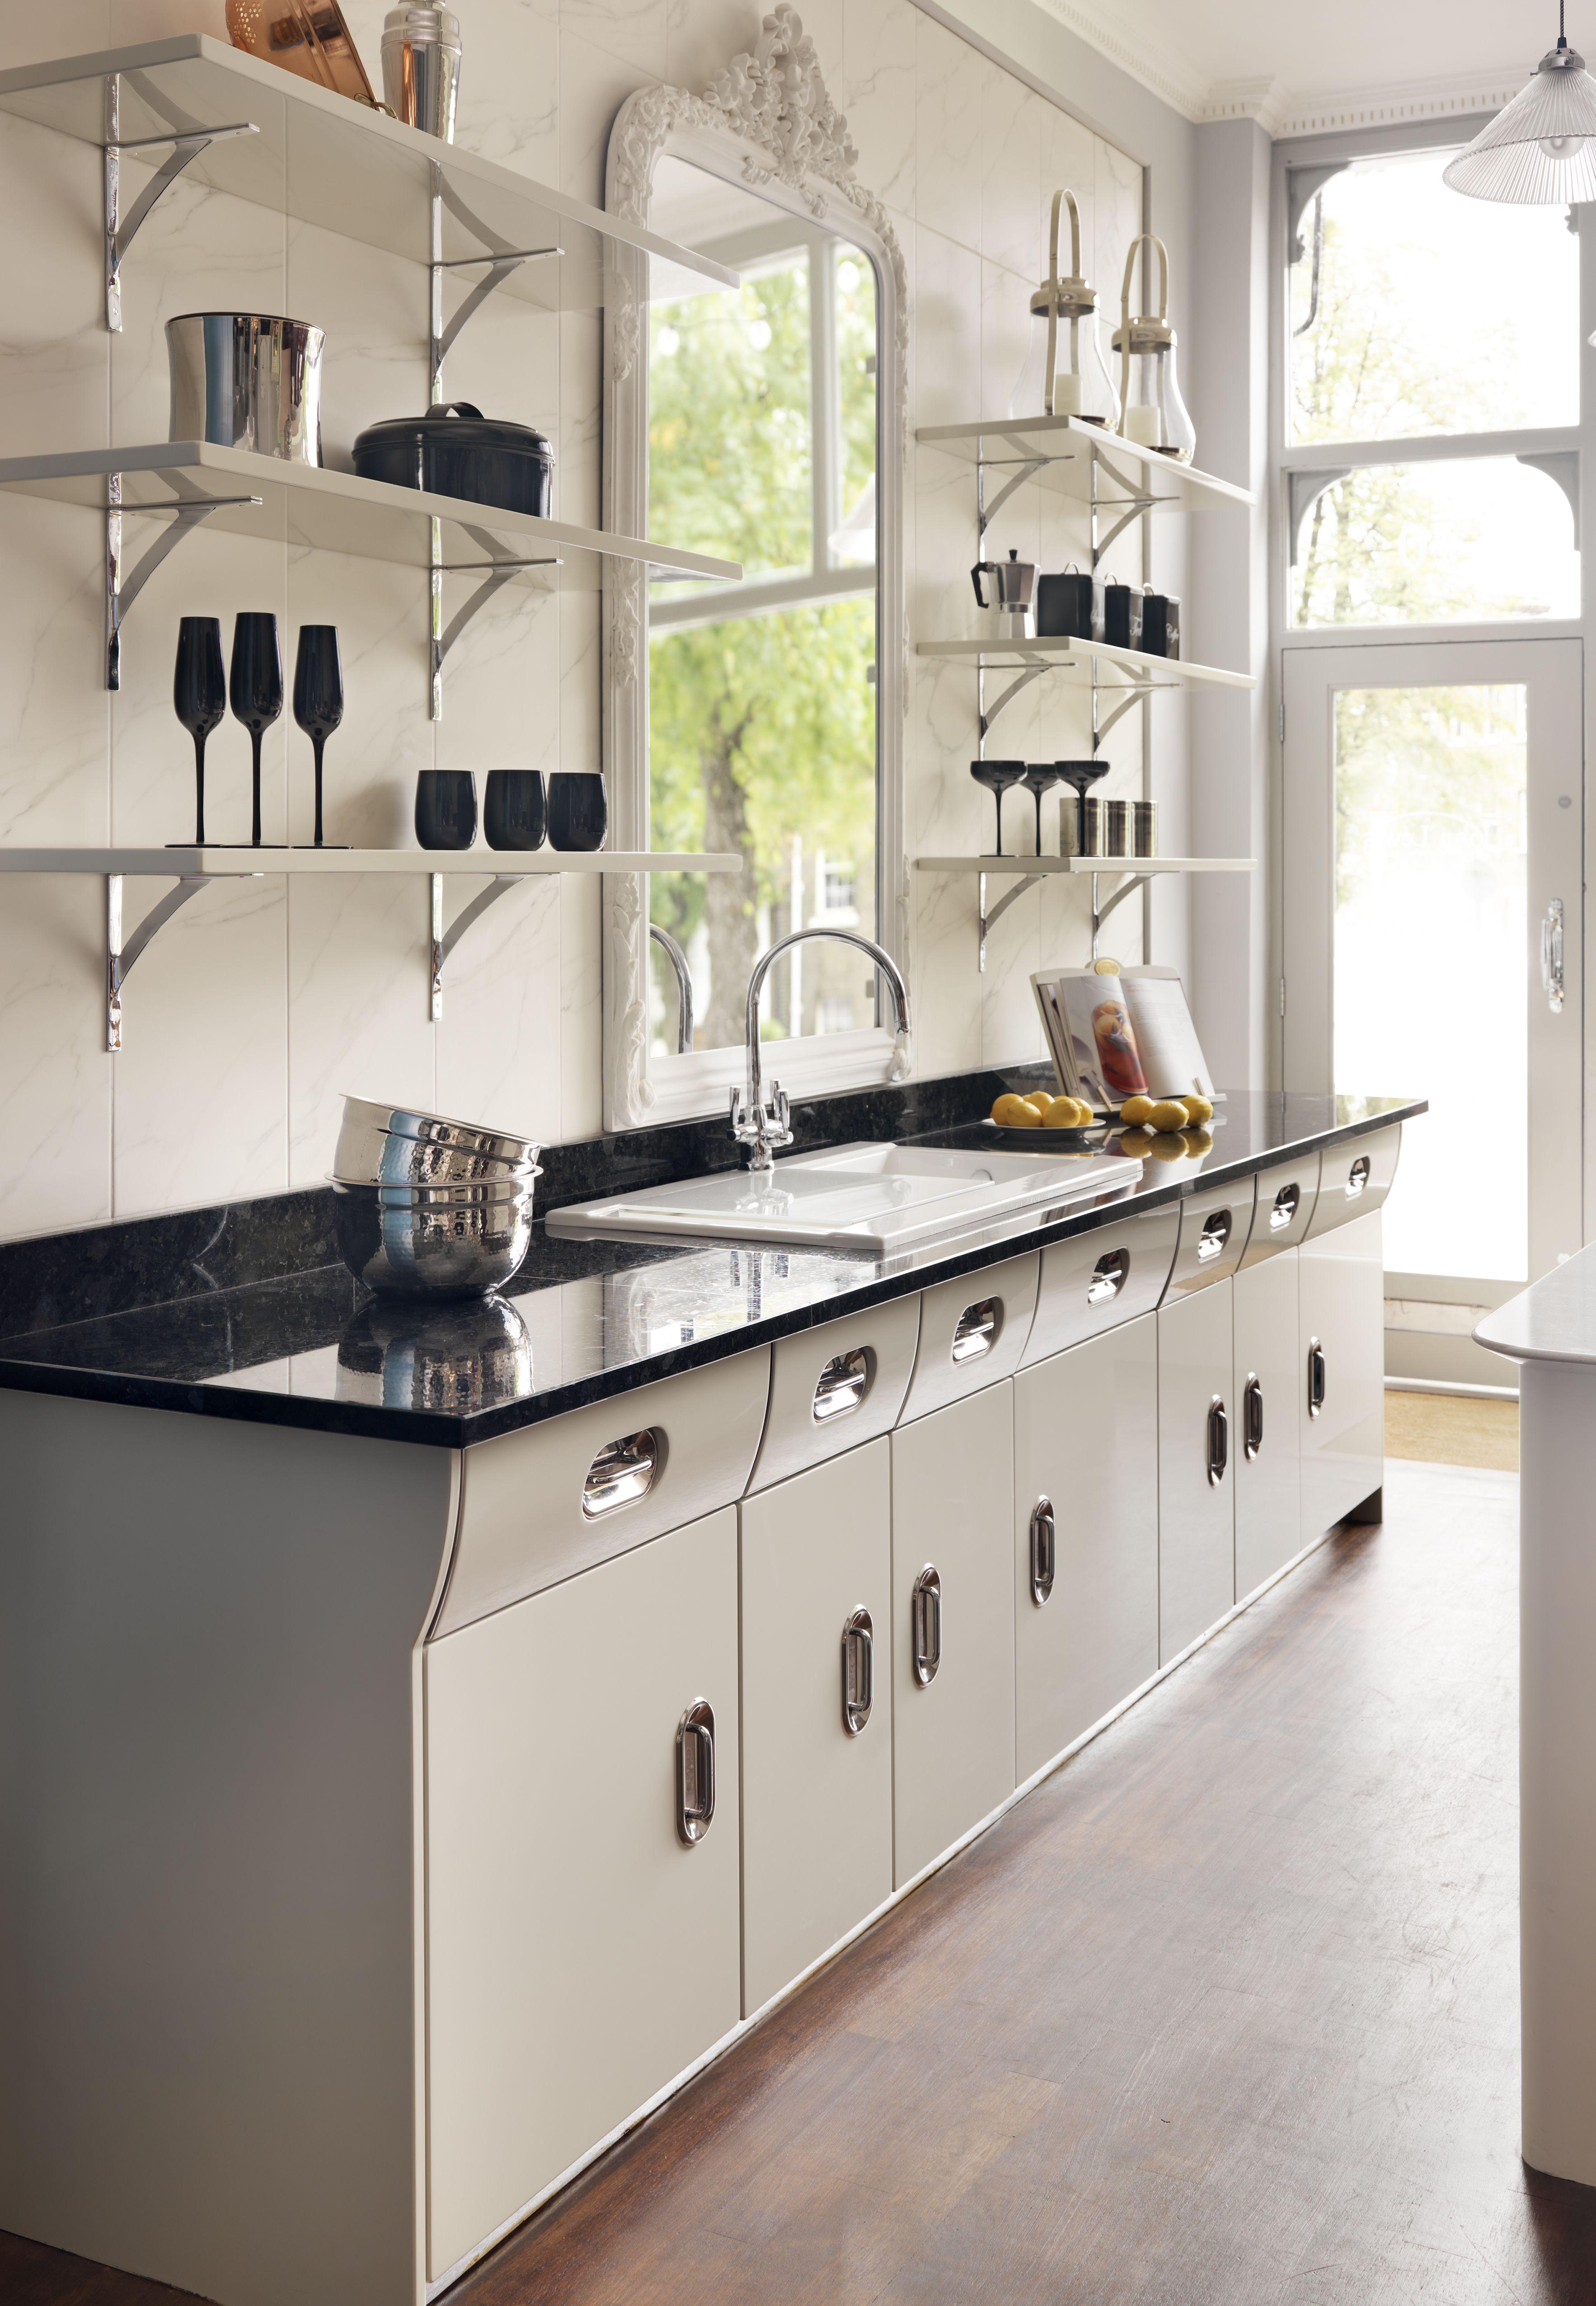 Deli Style Shelves Complement The Look Creme De La Creme Vintage Kitchen From John Lewis Of Hungerfor Retro Kitchen Modern Kitchen Set Kitchen Cabinet Styles